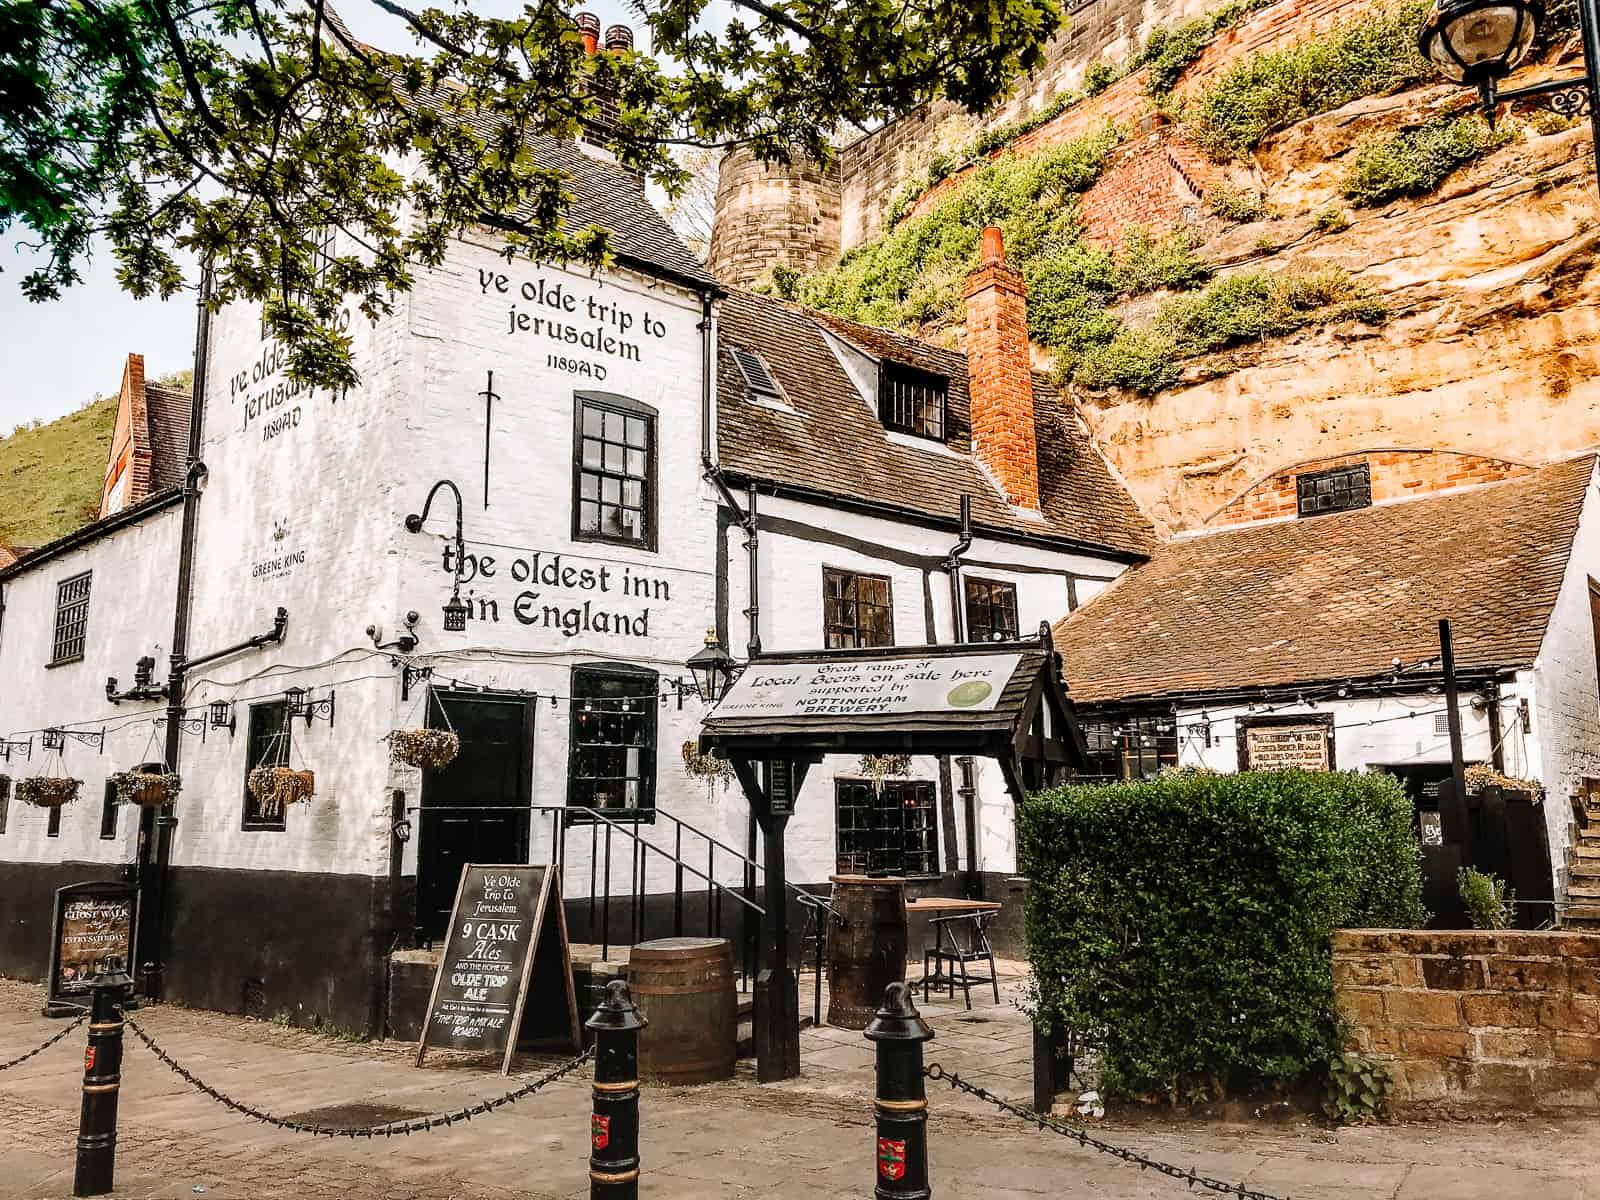 The Ye Olde Trip to Jerusalem in Nottingham